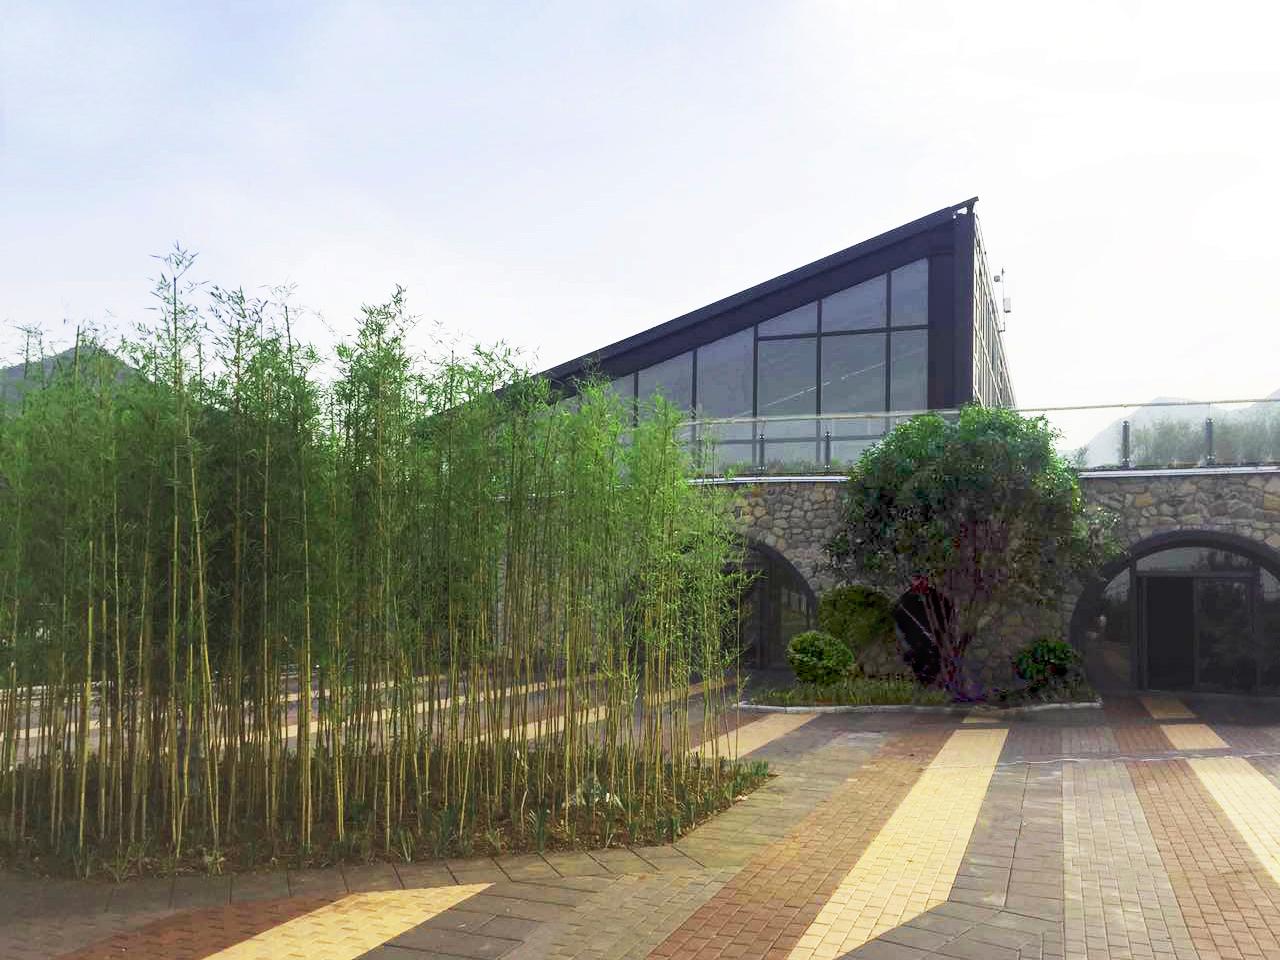 Zhangwu Tourist Centre (2003)